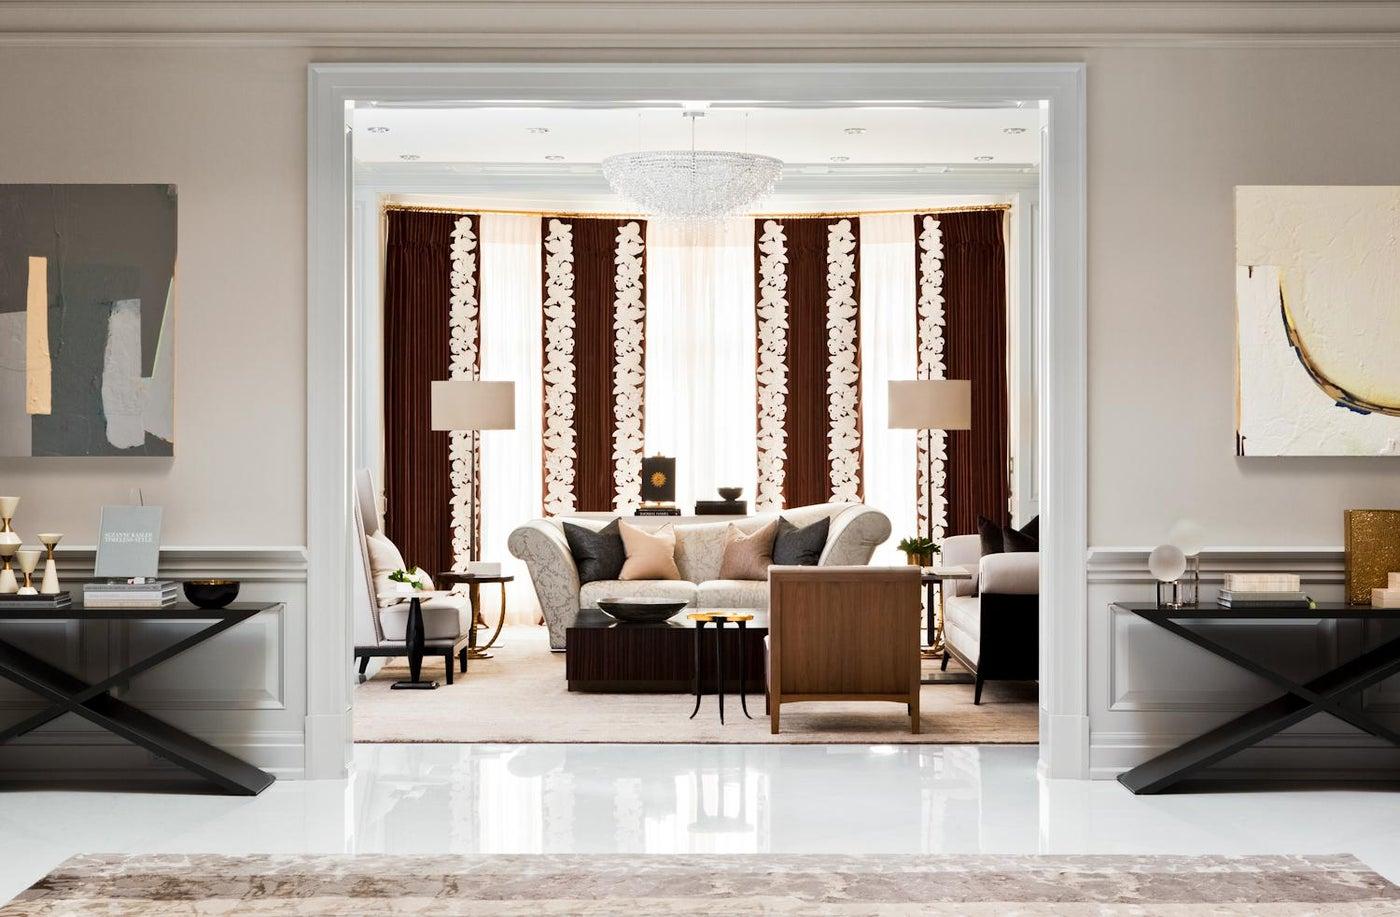 Grand Room designed by Elizabeth Metcalfe Interiors & Design Inc.